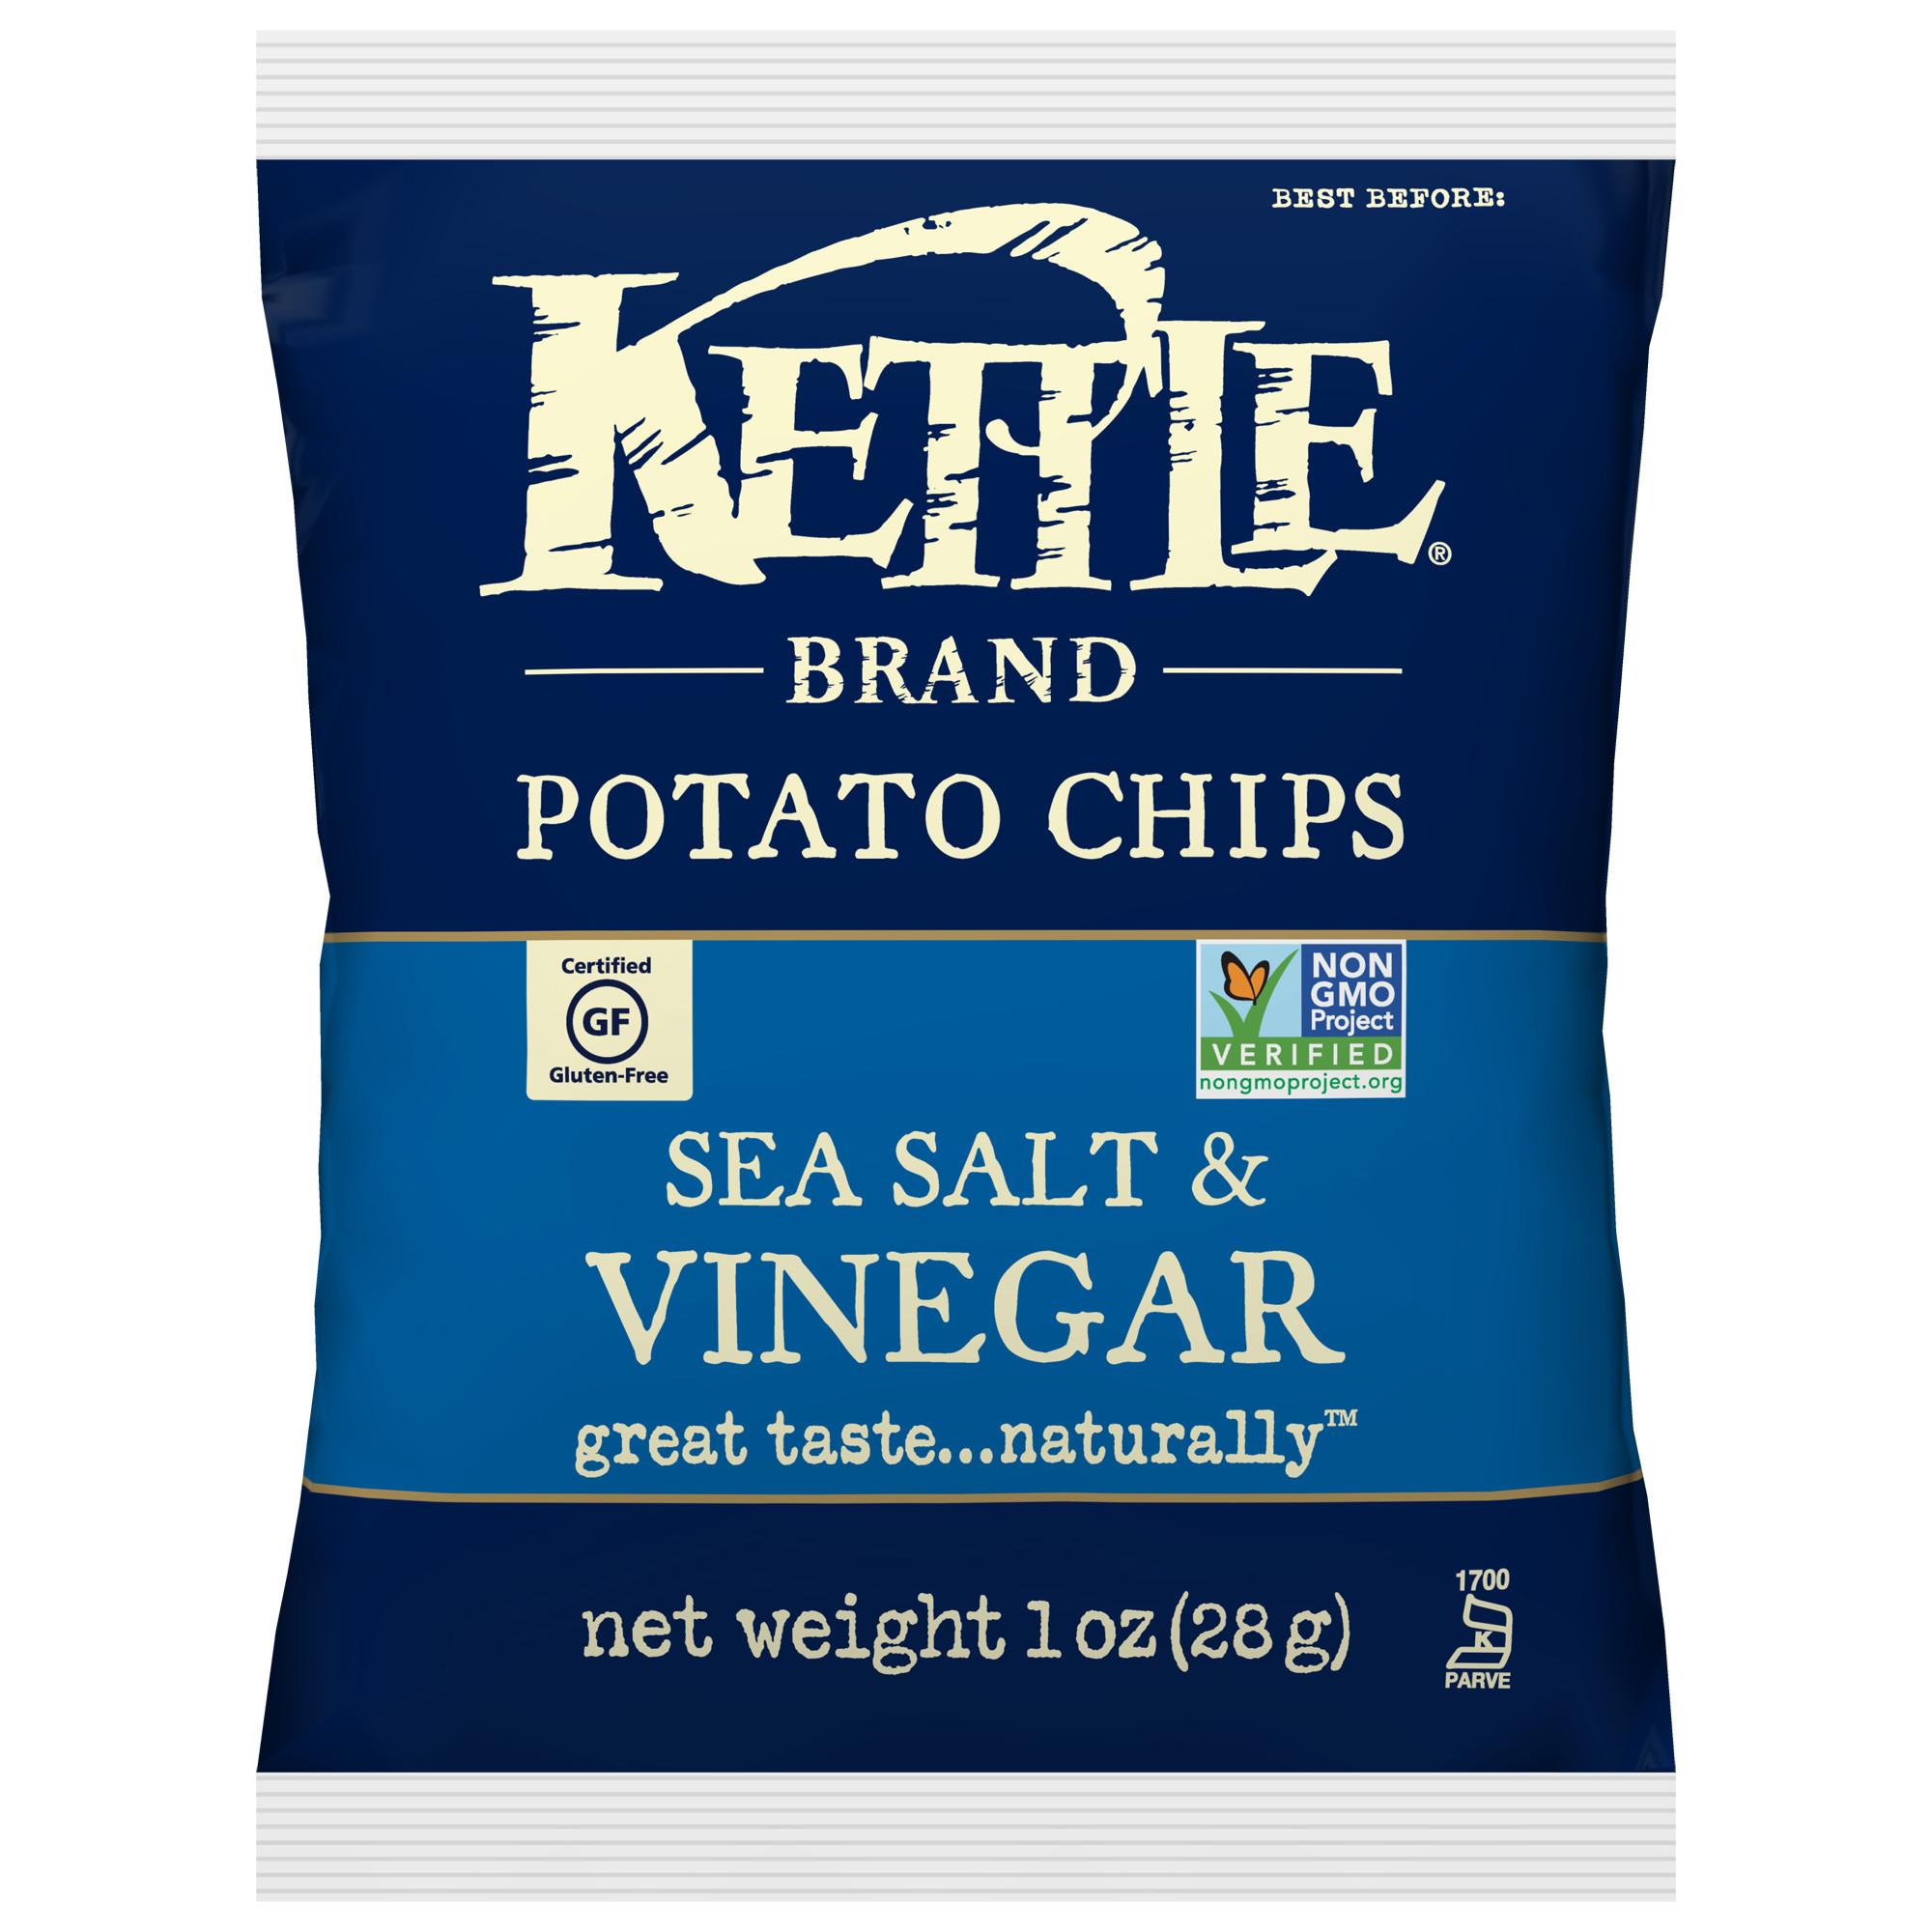 Kettle Brand Sea Salt and Vinegar Multipack of Potato Chips, 1 Oz, 72 Ct